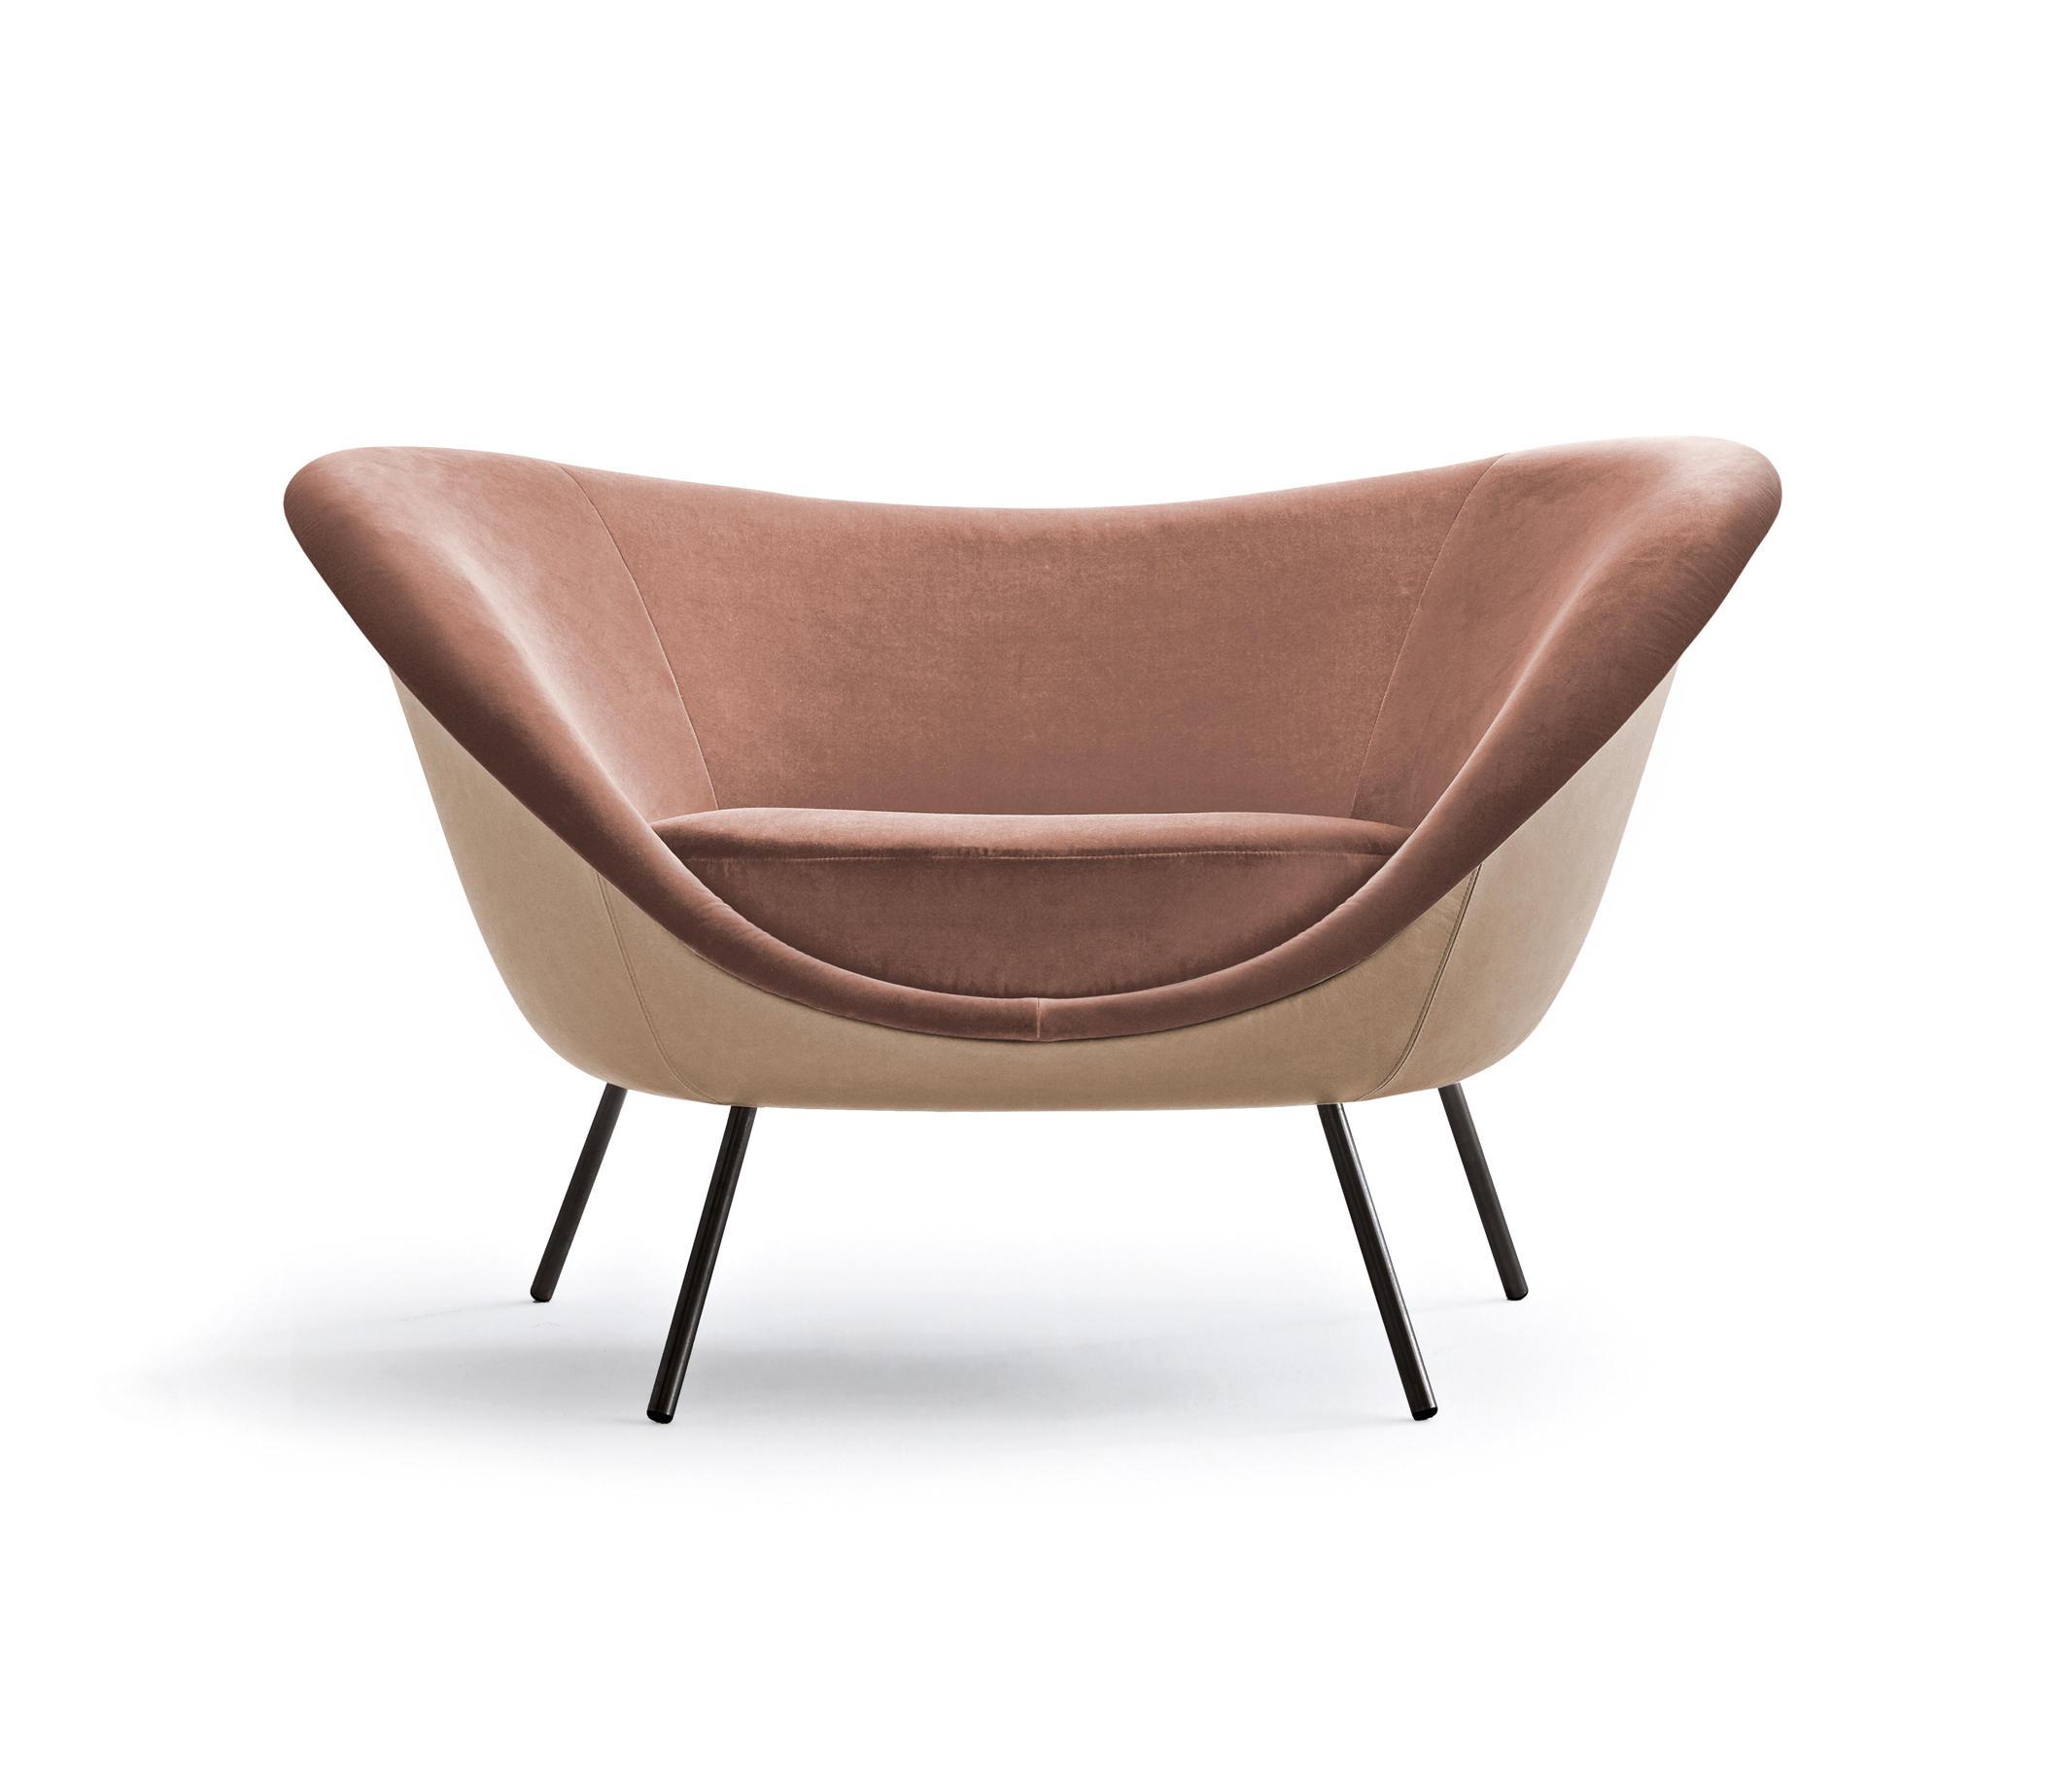 Gio Ponti, Molteni & C, Iconic Design, Iconic Designs, Design Icons